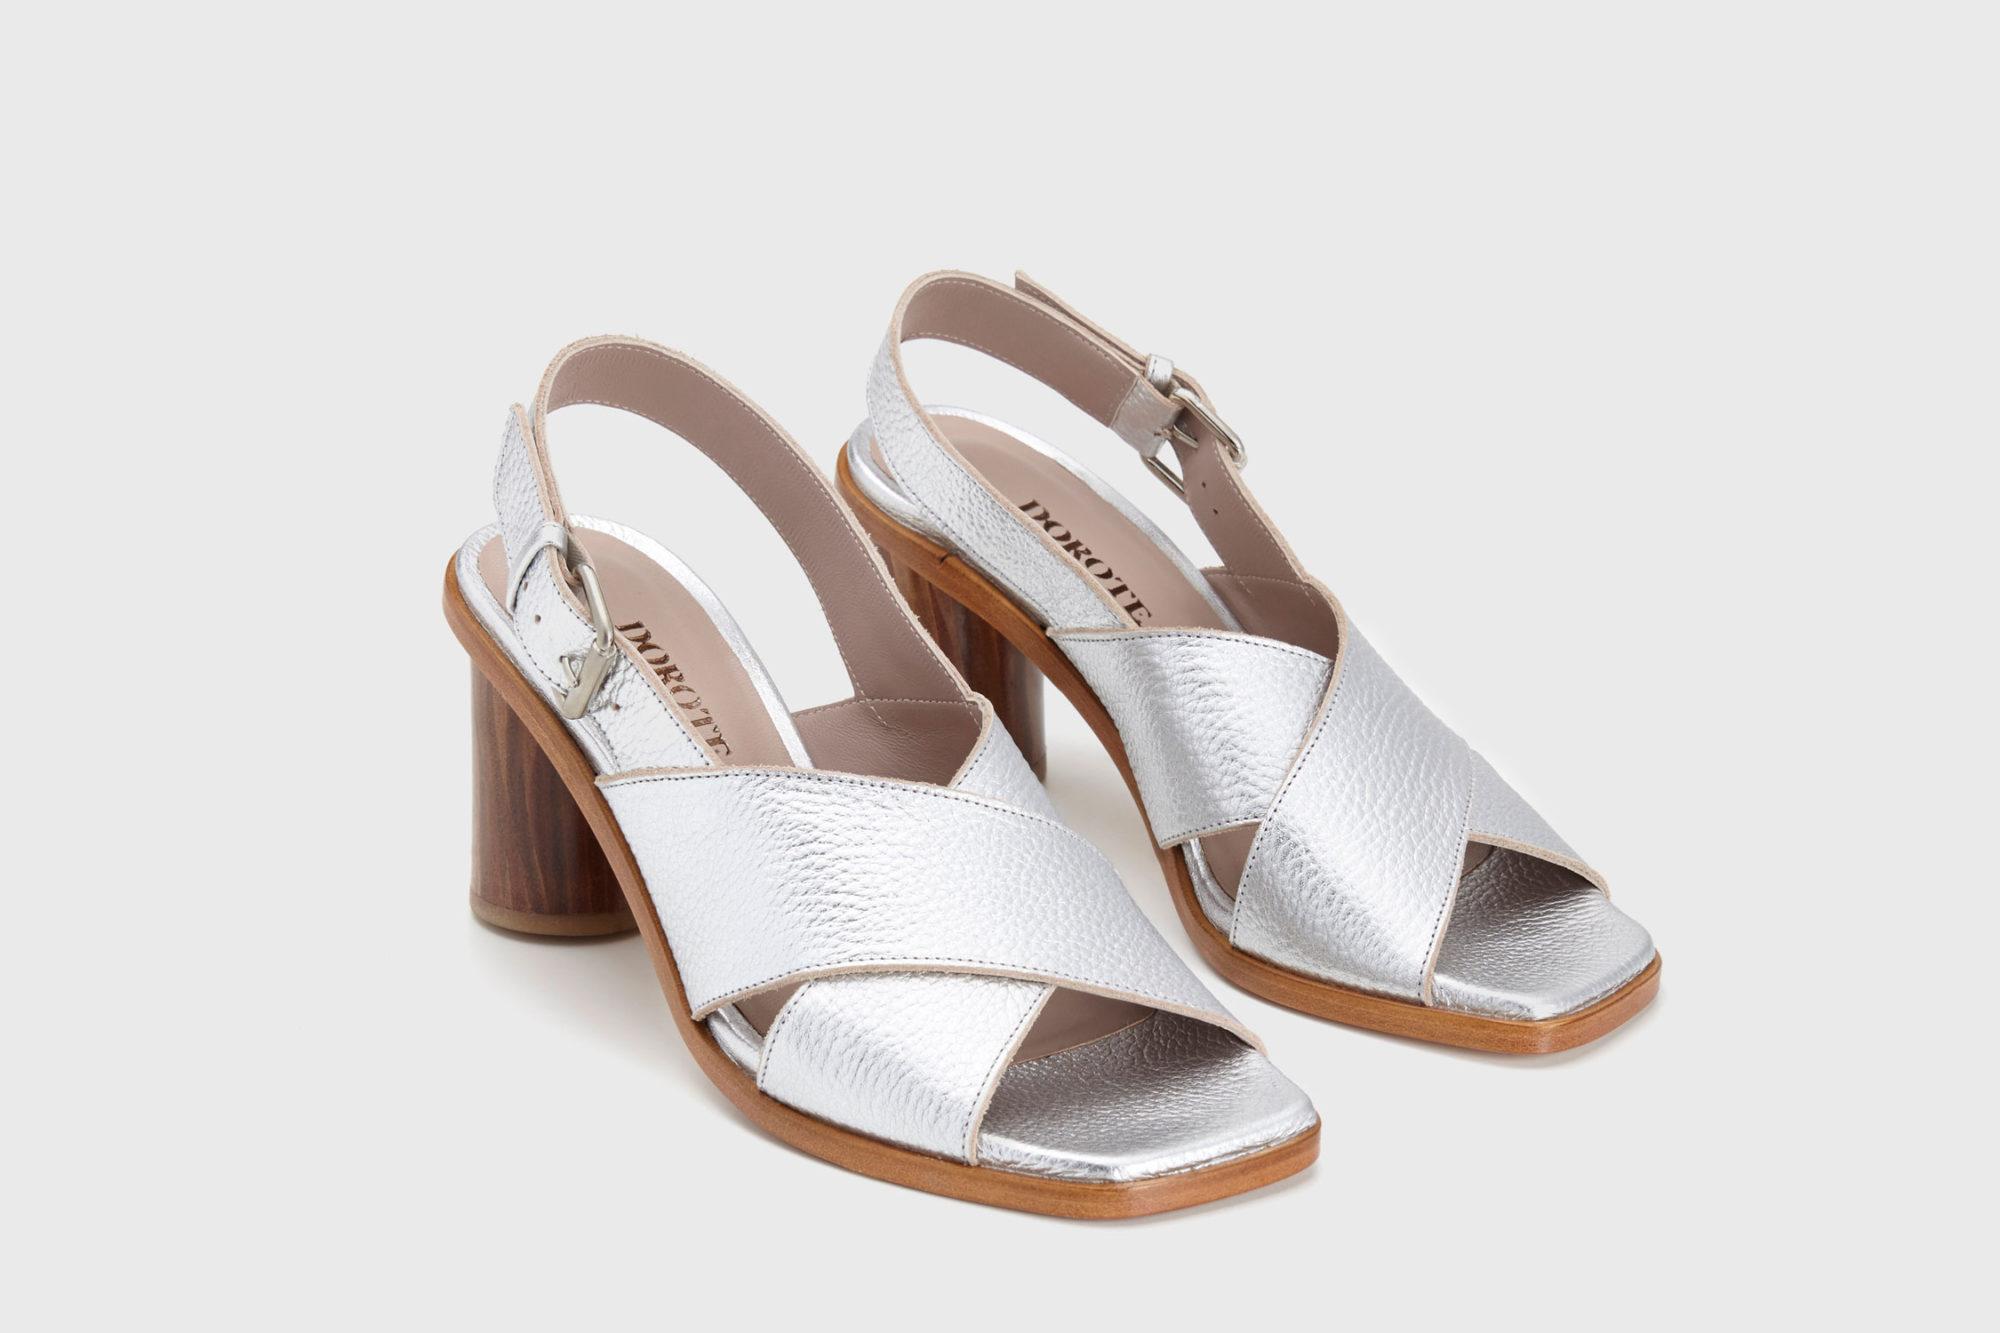 Dorotea sandalia de tacón alto Jazz plateado ss17 par